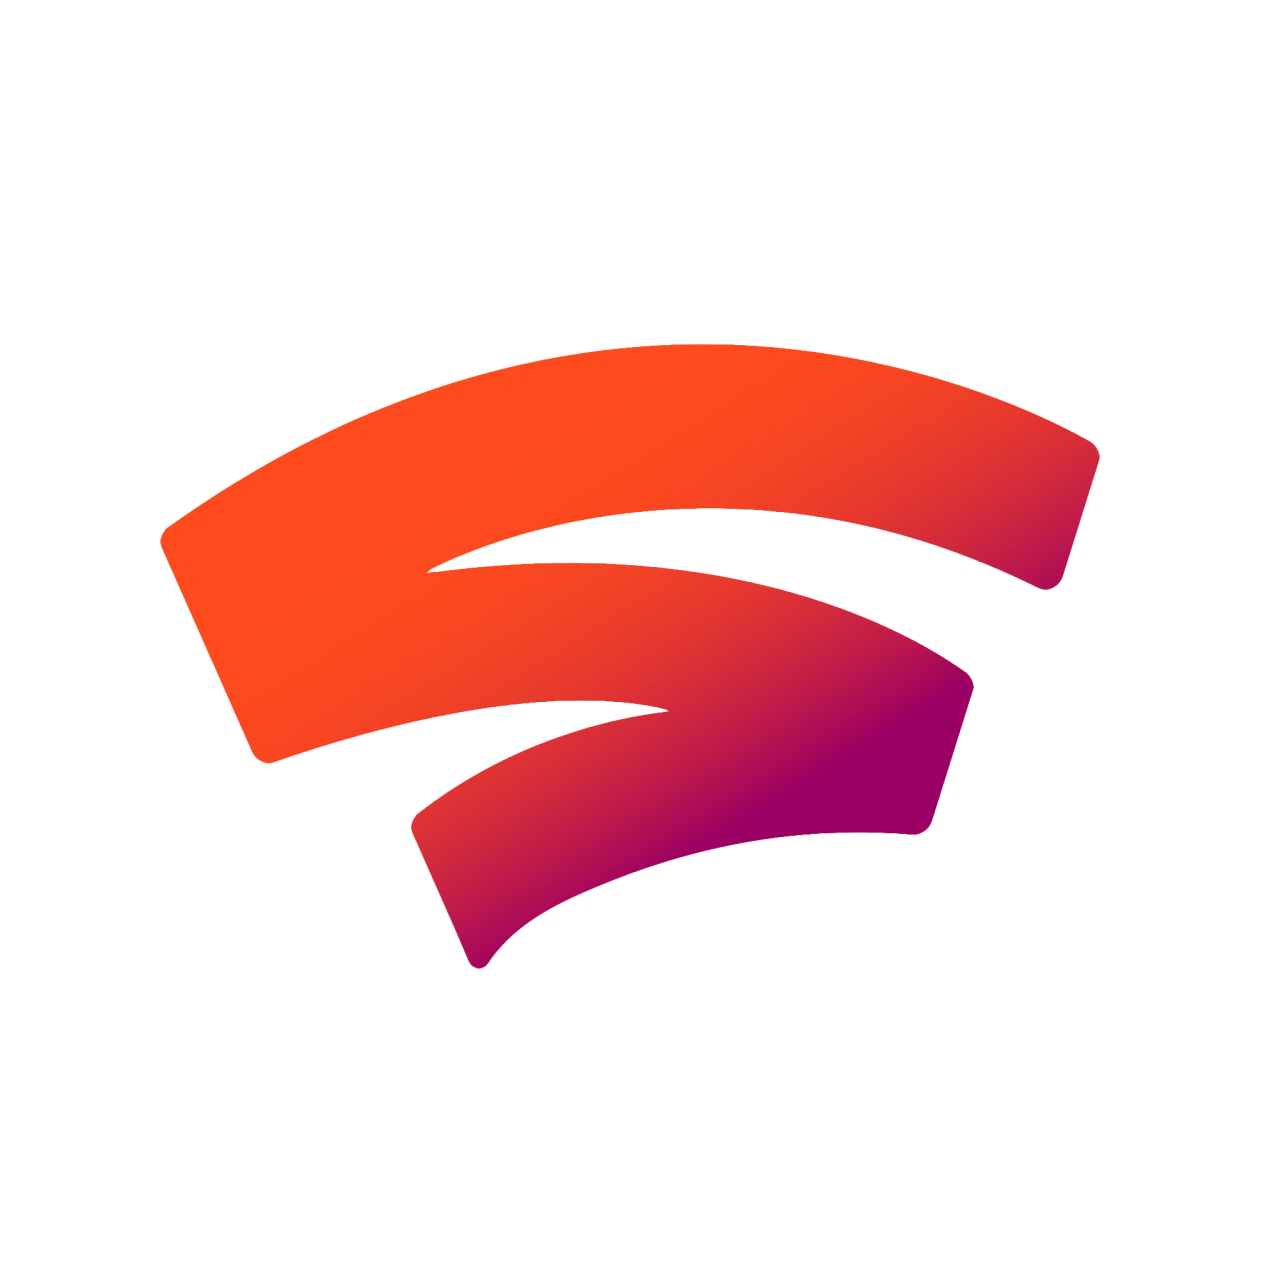 Google Stadia Logo PNG Image